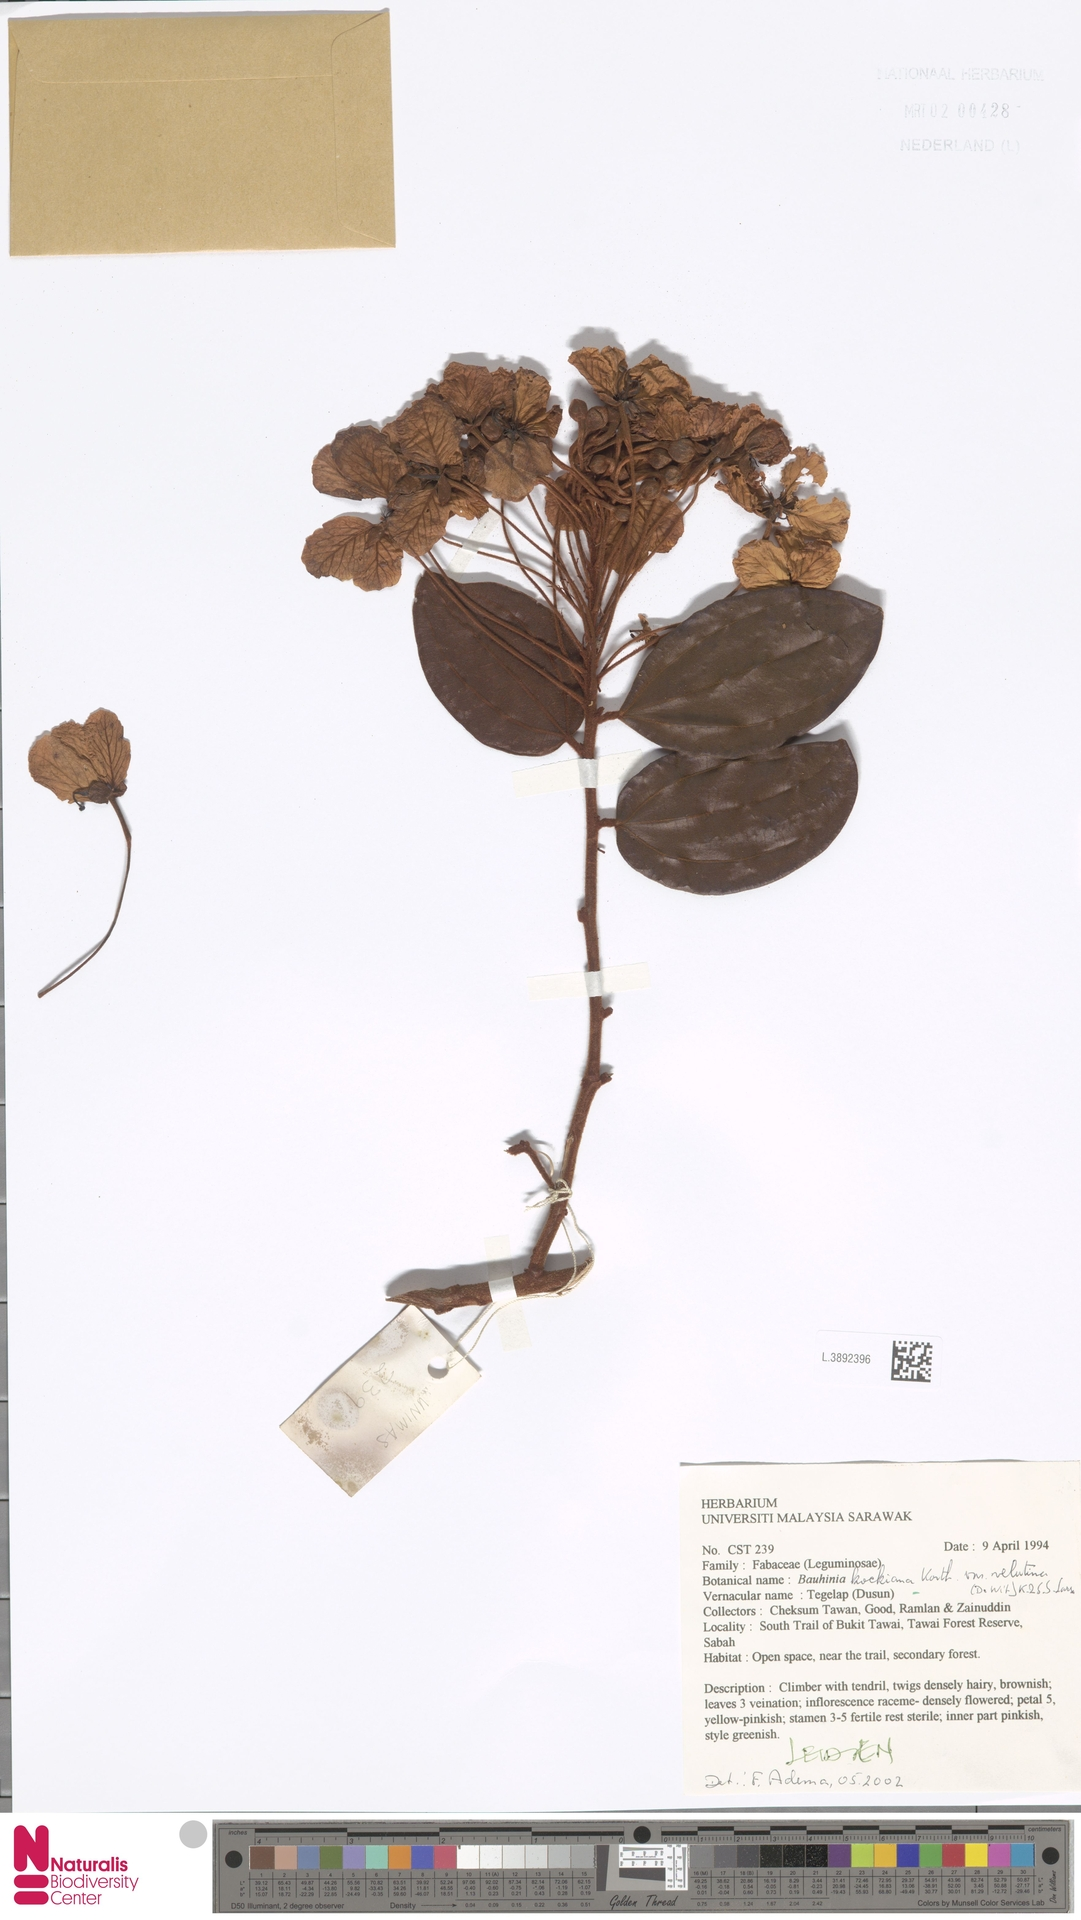 L.3892396   Bauhinia kockiana var. velutina (de Wit) K.Larsen & S.S.Larsen